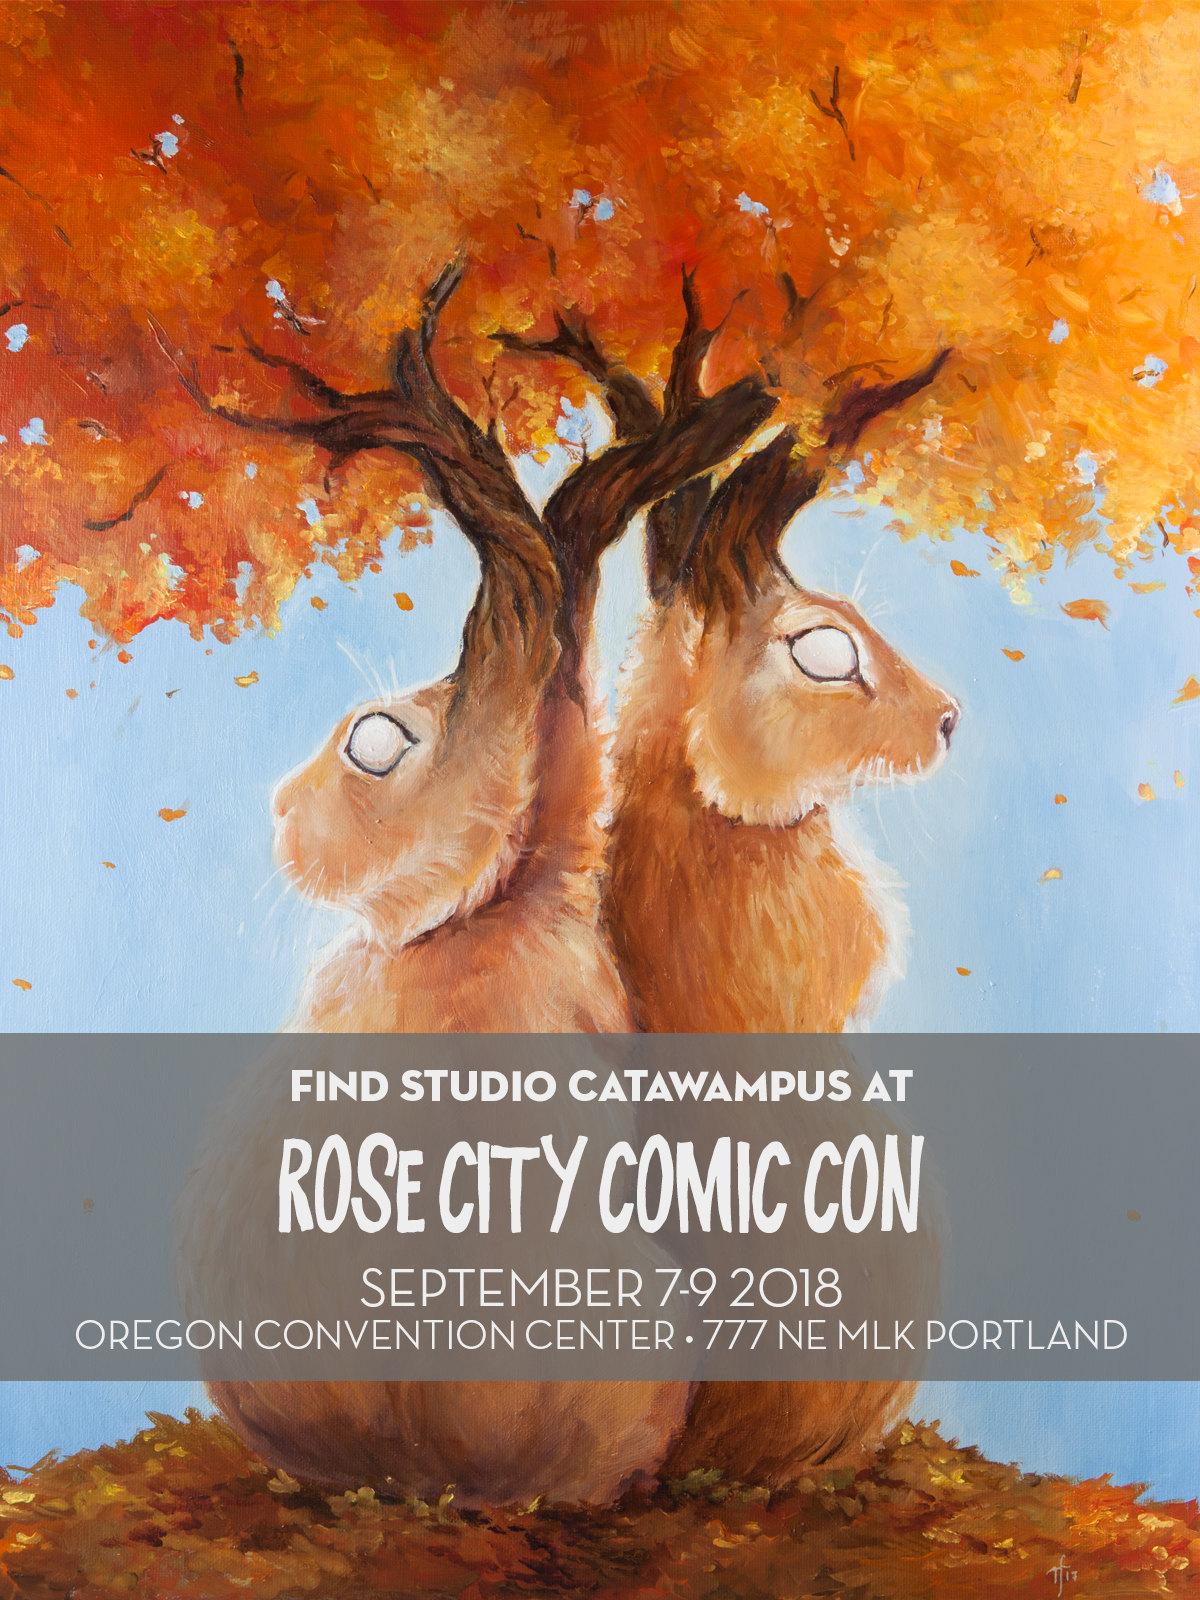 rose-city-promo.jpg